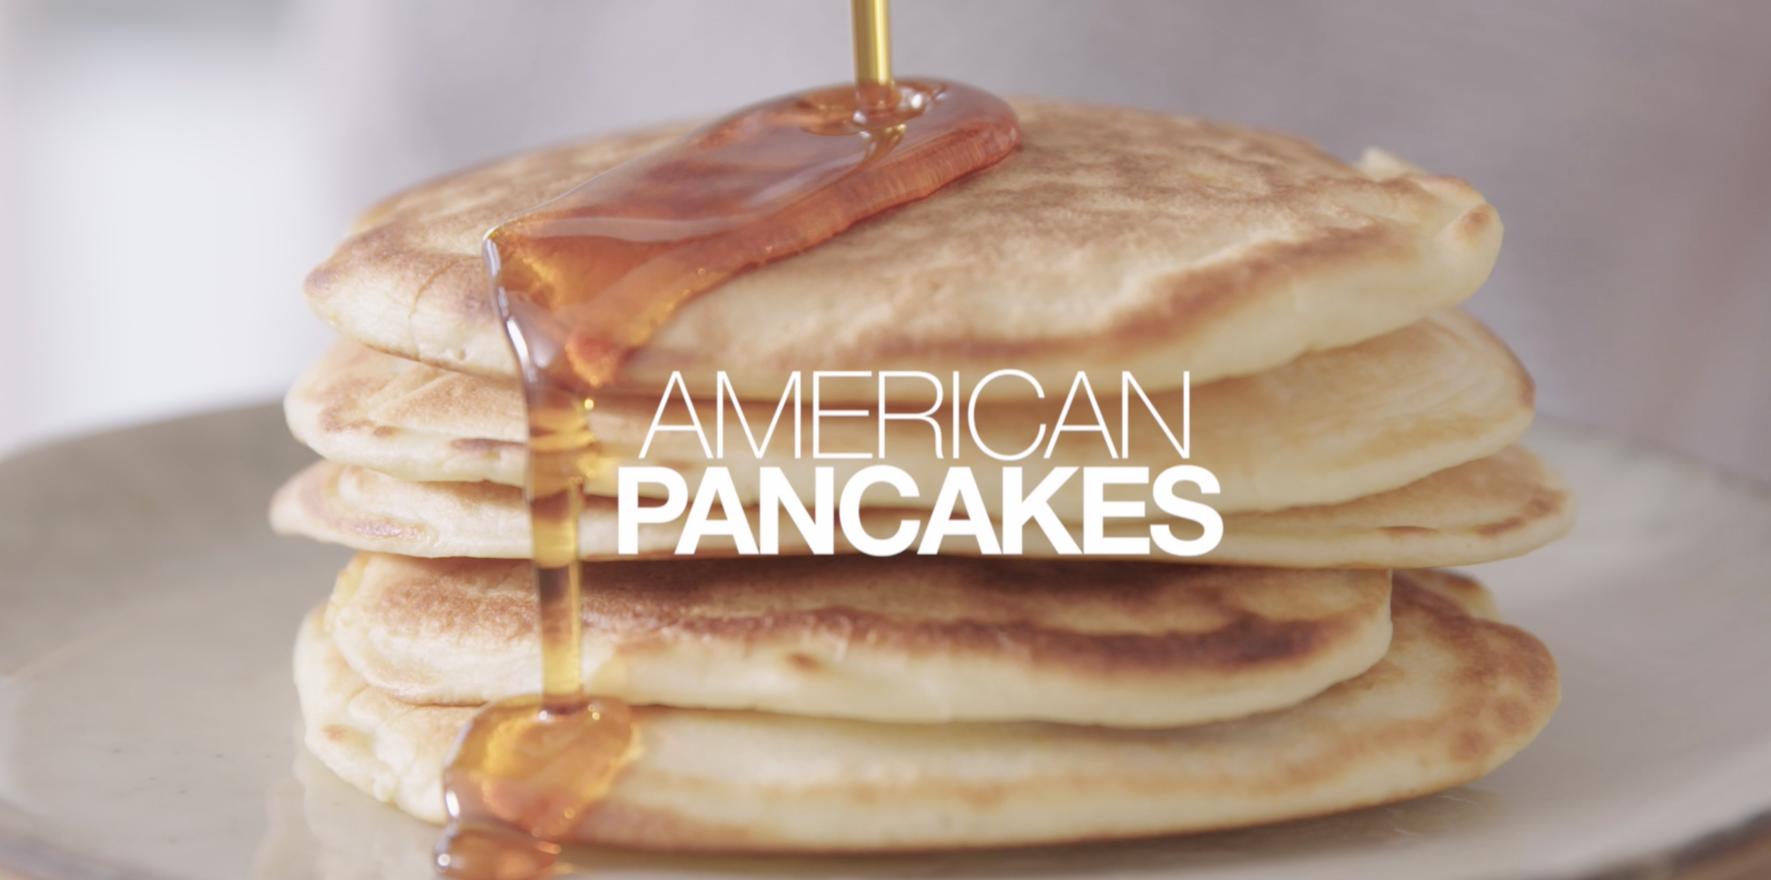 american_pancakes_still.png